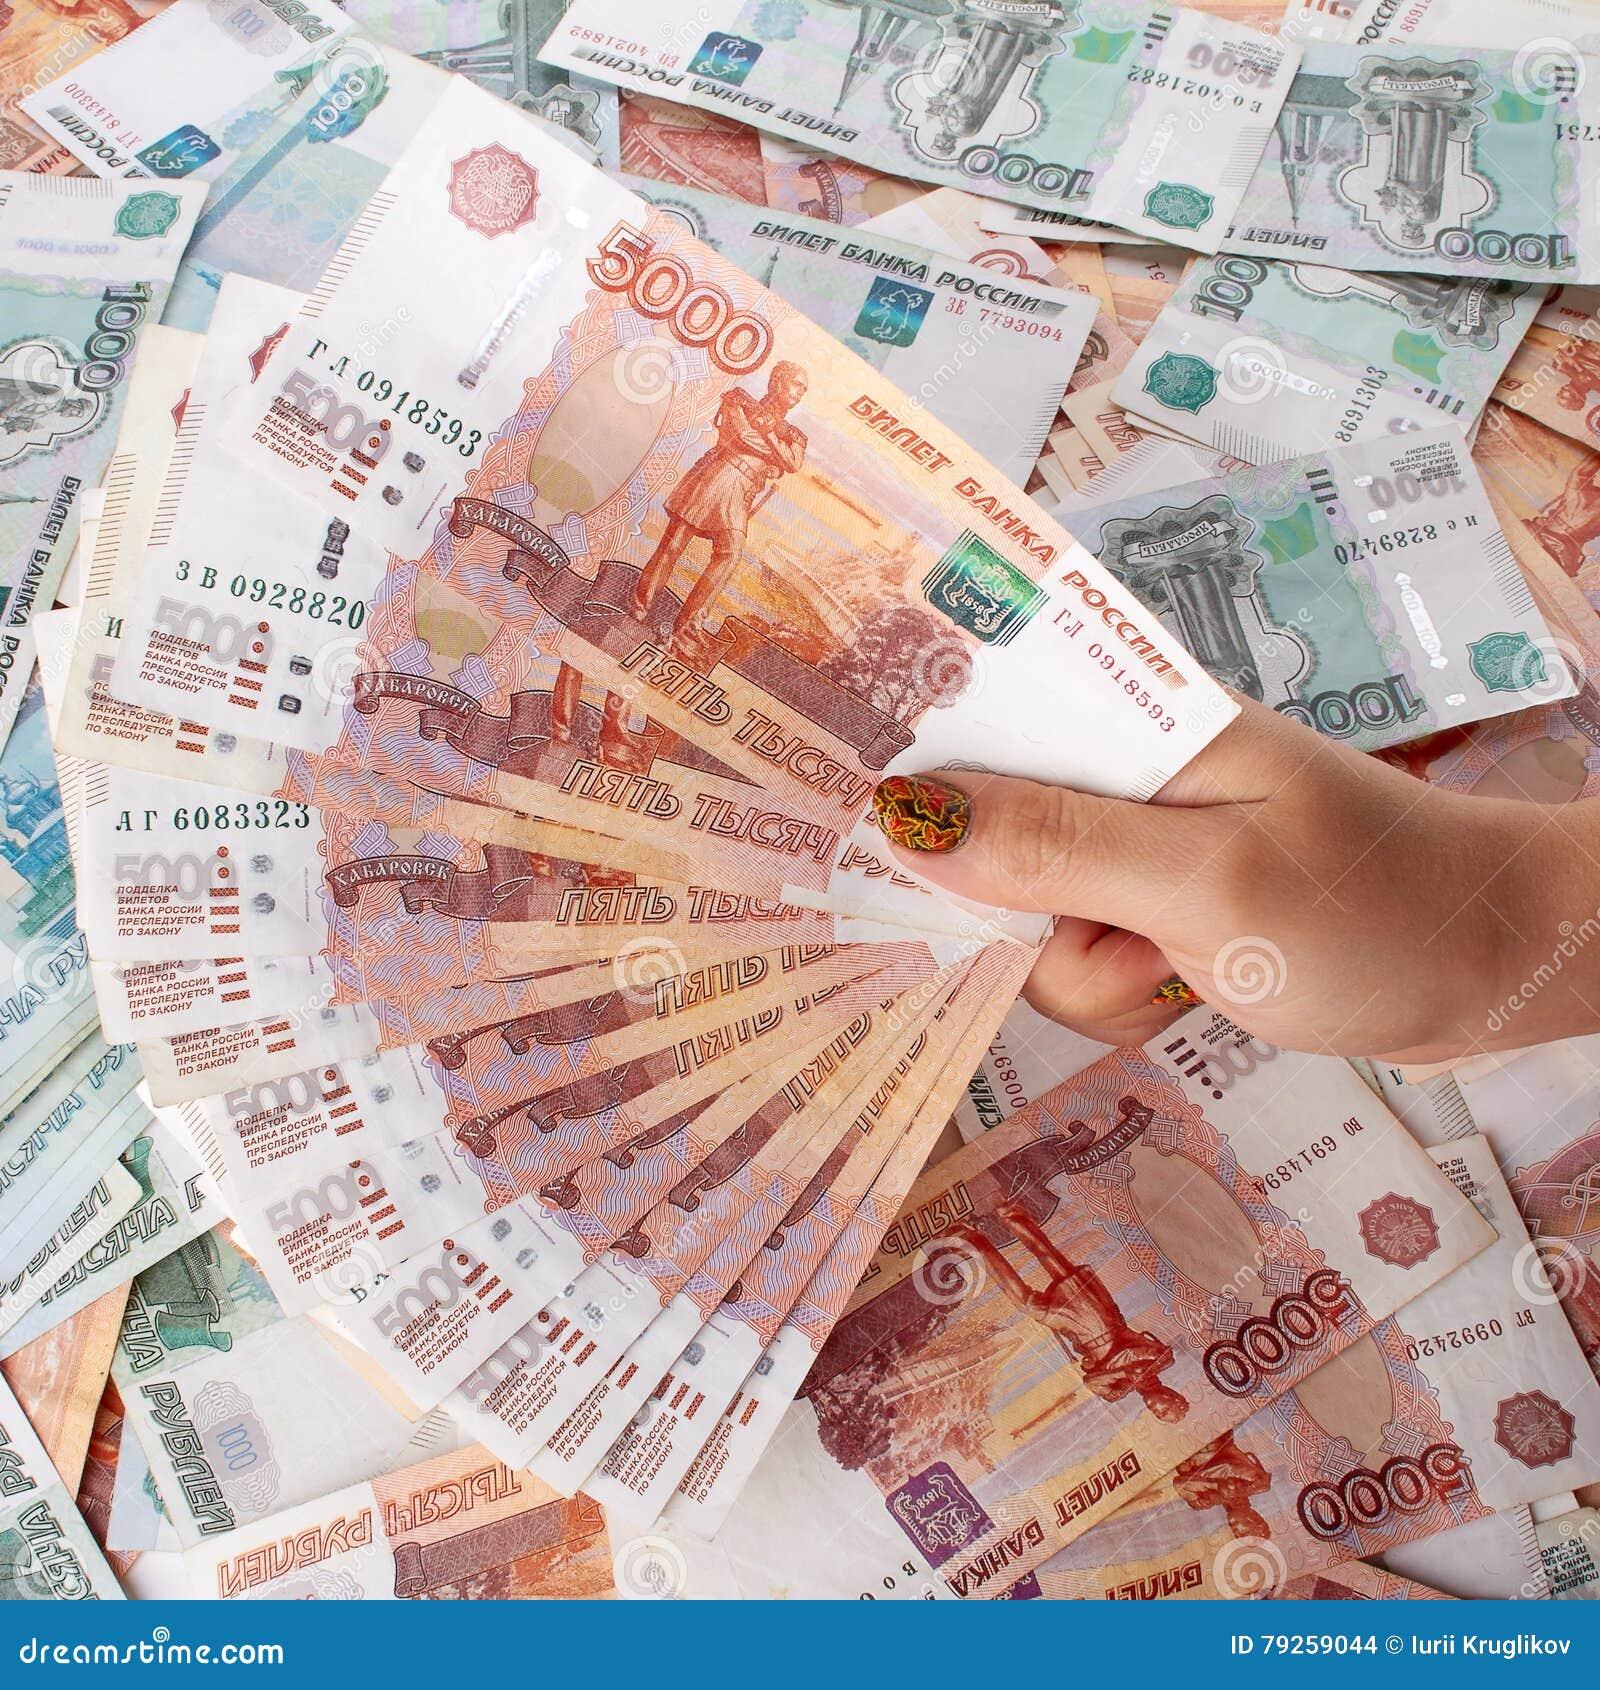 взять займ 500 рублей без отказа